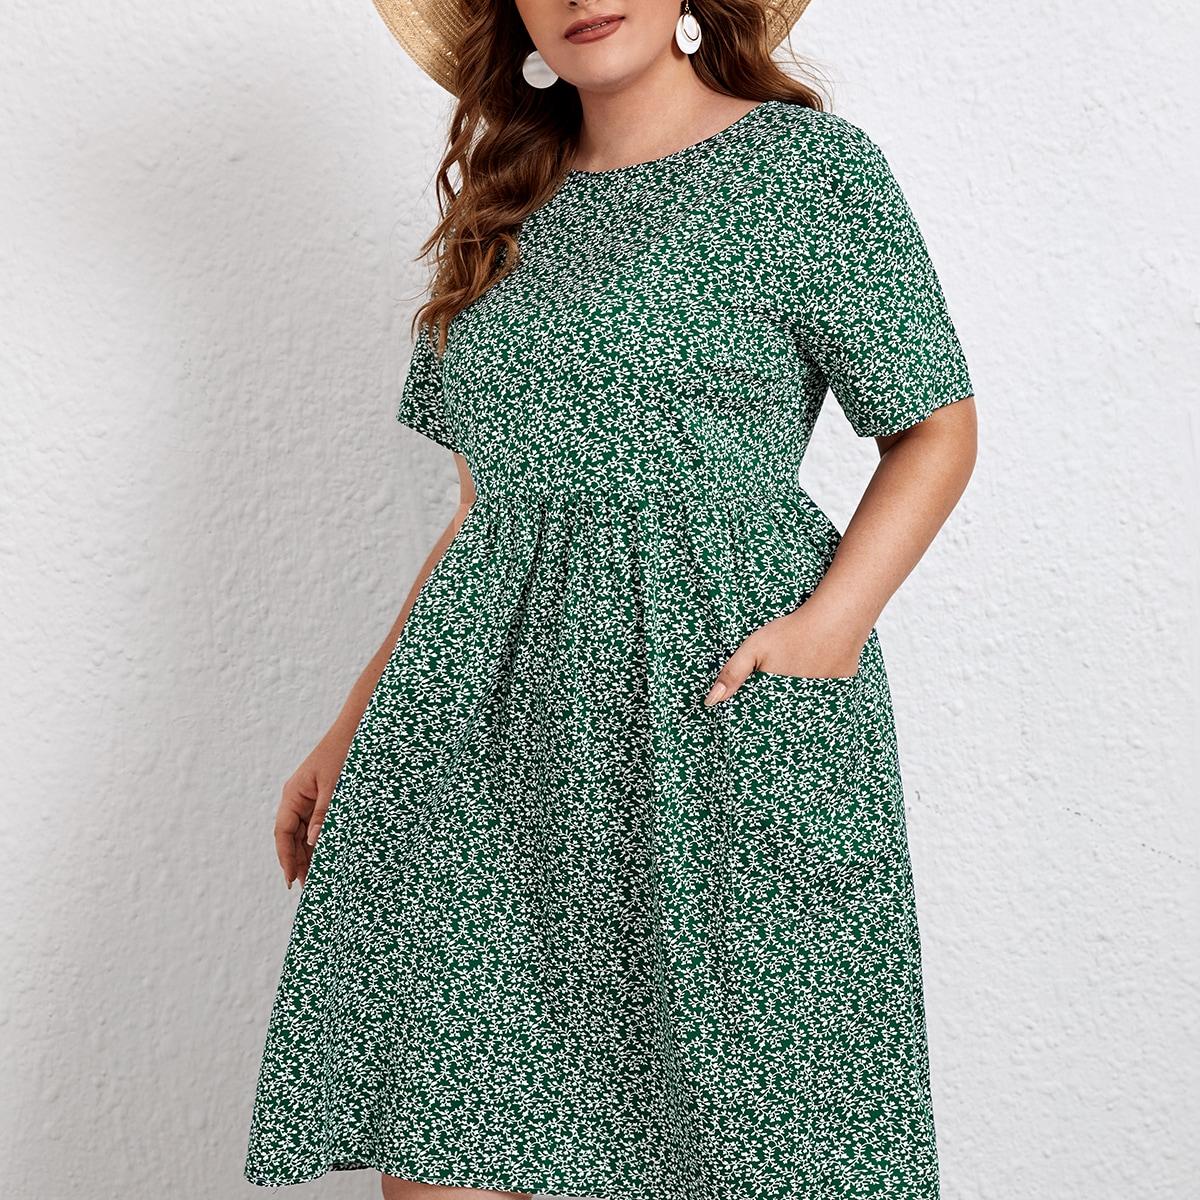 Plus Plants Print Slant Pocket A-line Dress, SHEIN  - buy with discount